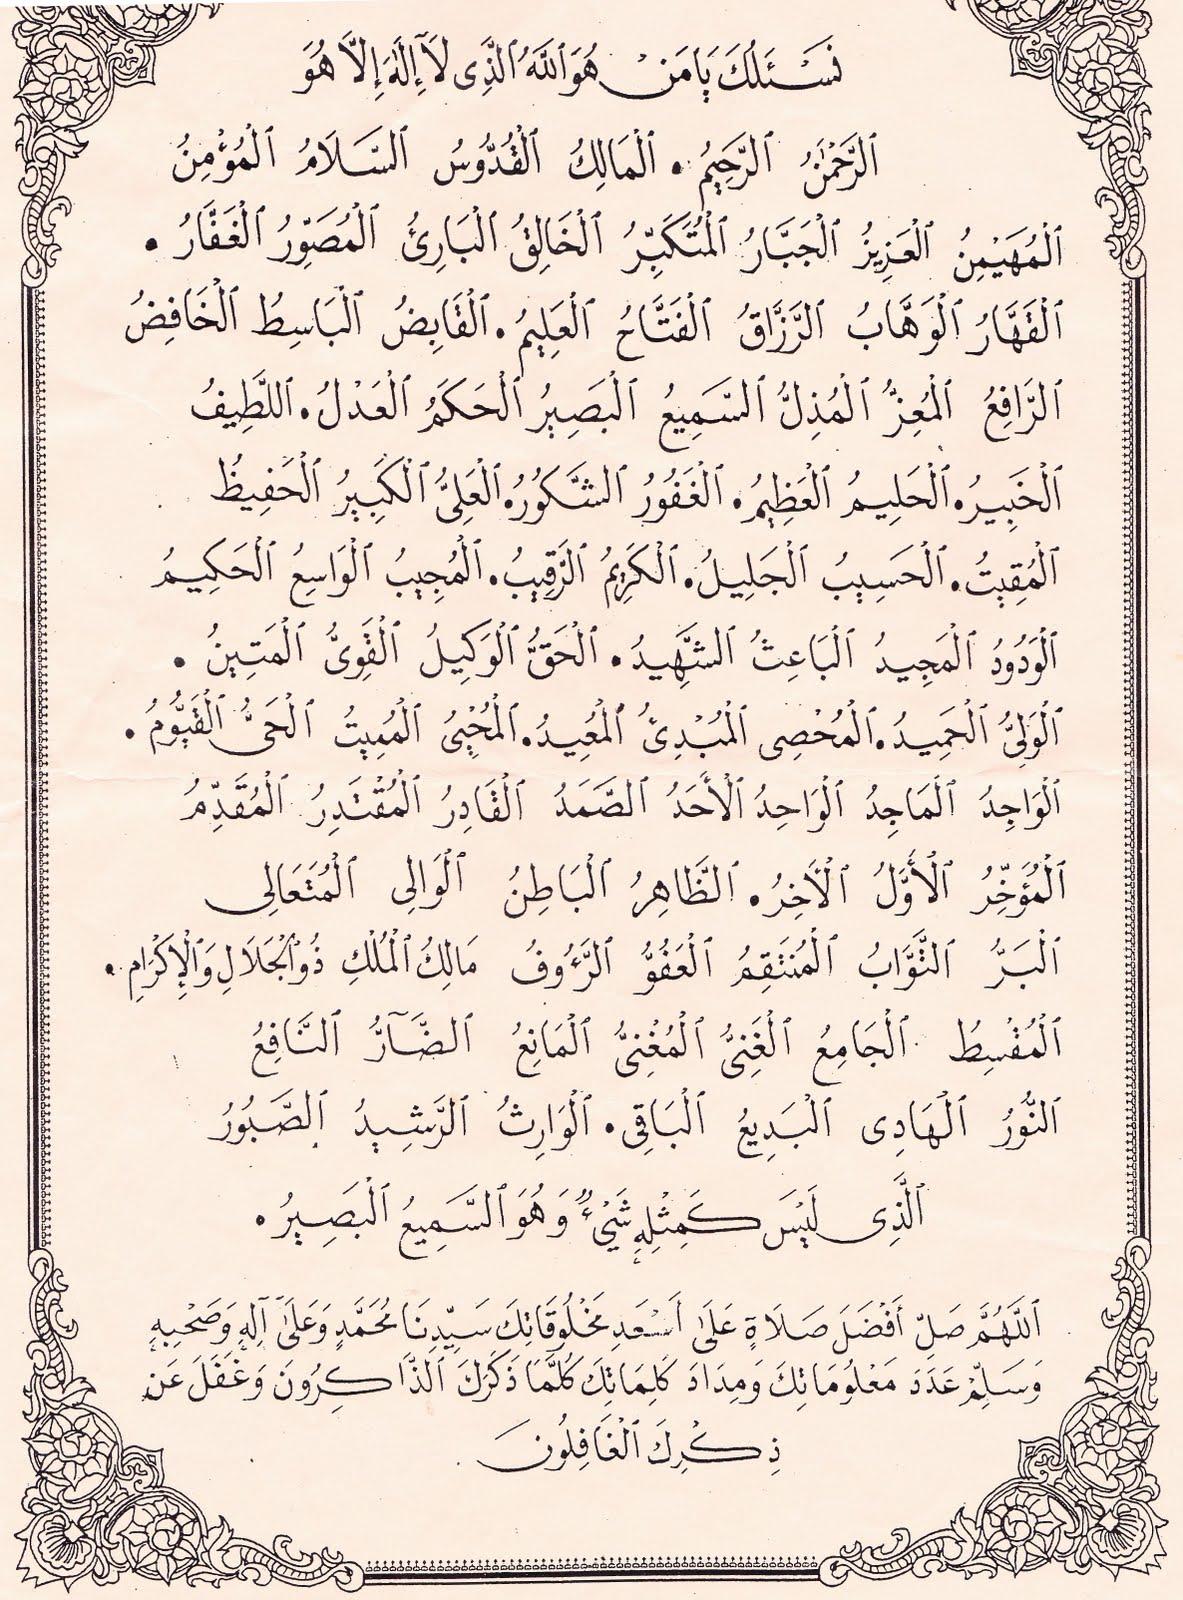 asma ul husna 99 names of allah by hisham abbas 99 names of allah ...